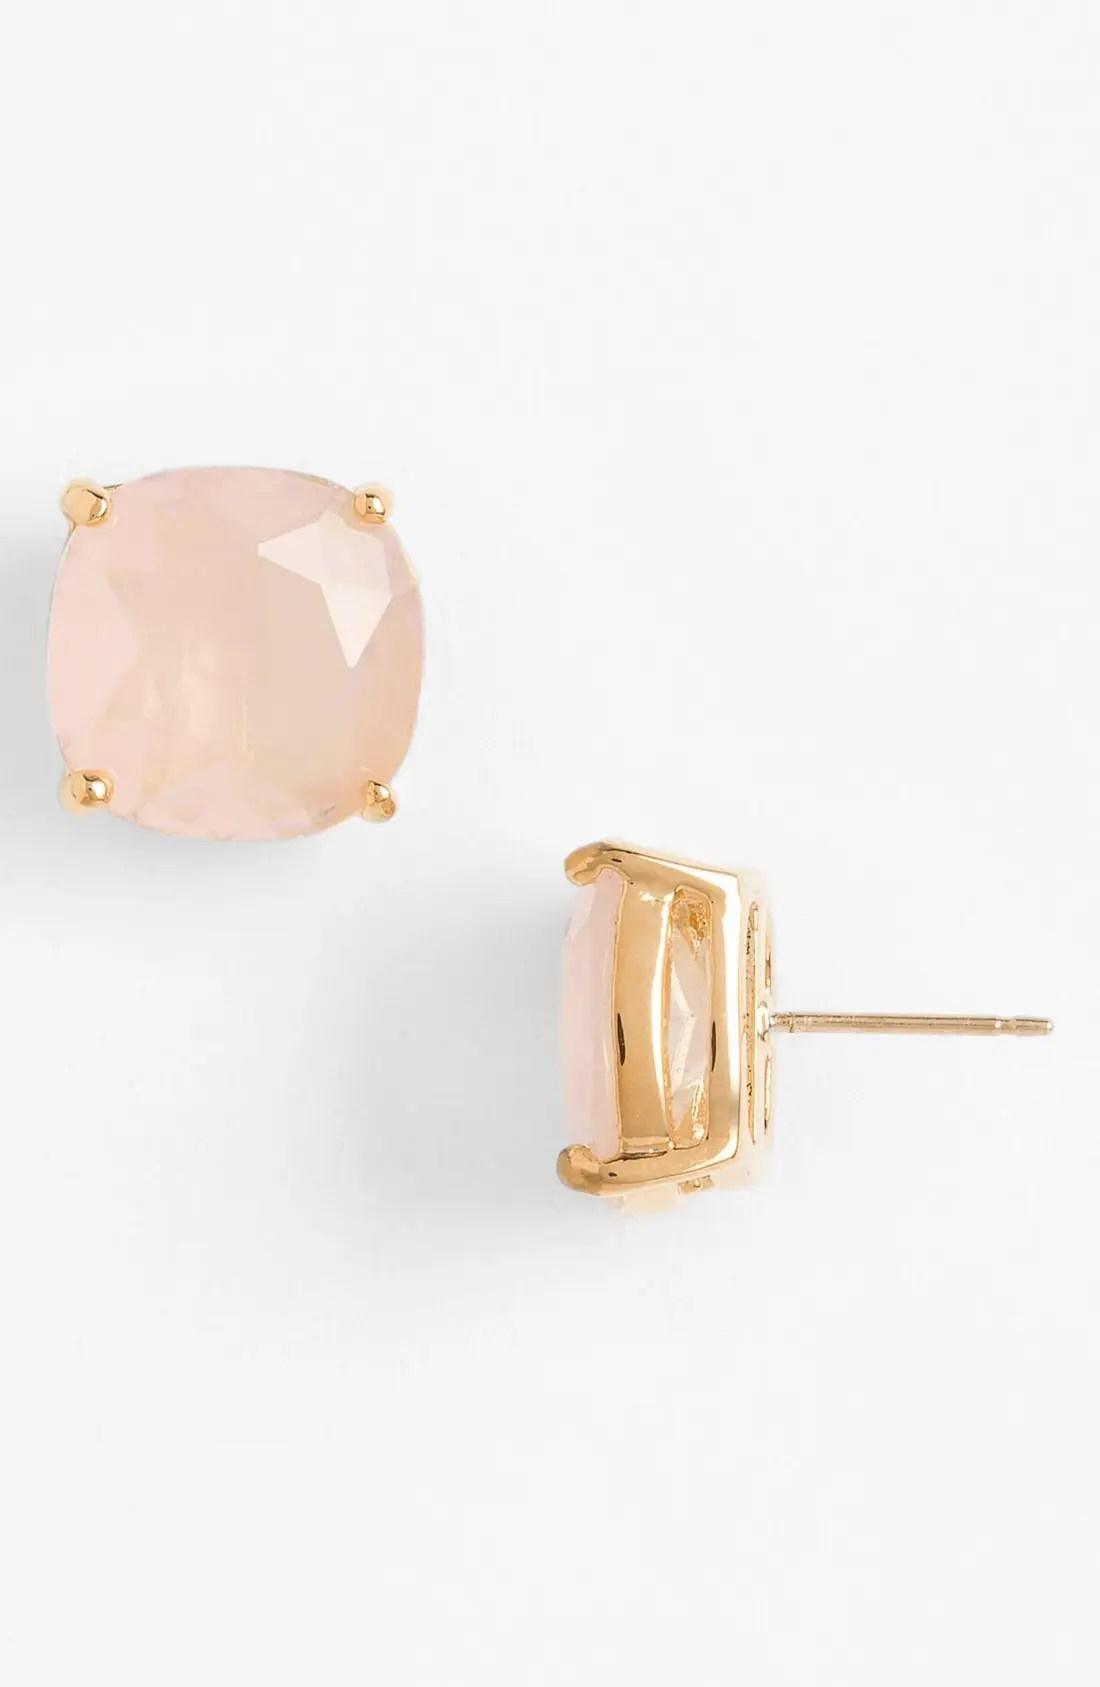 mini small square semiprecious stone stud earrings, Main, color, LIGHT PINK/ GOLD